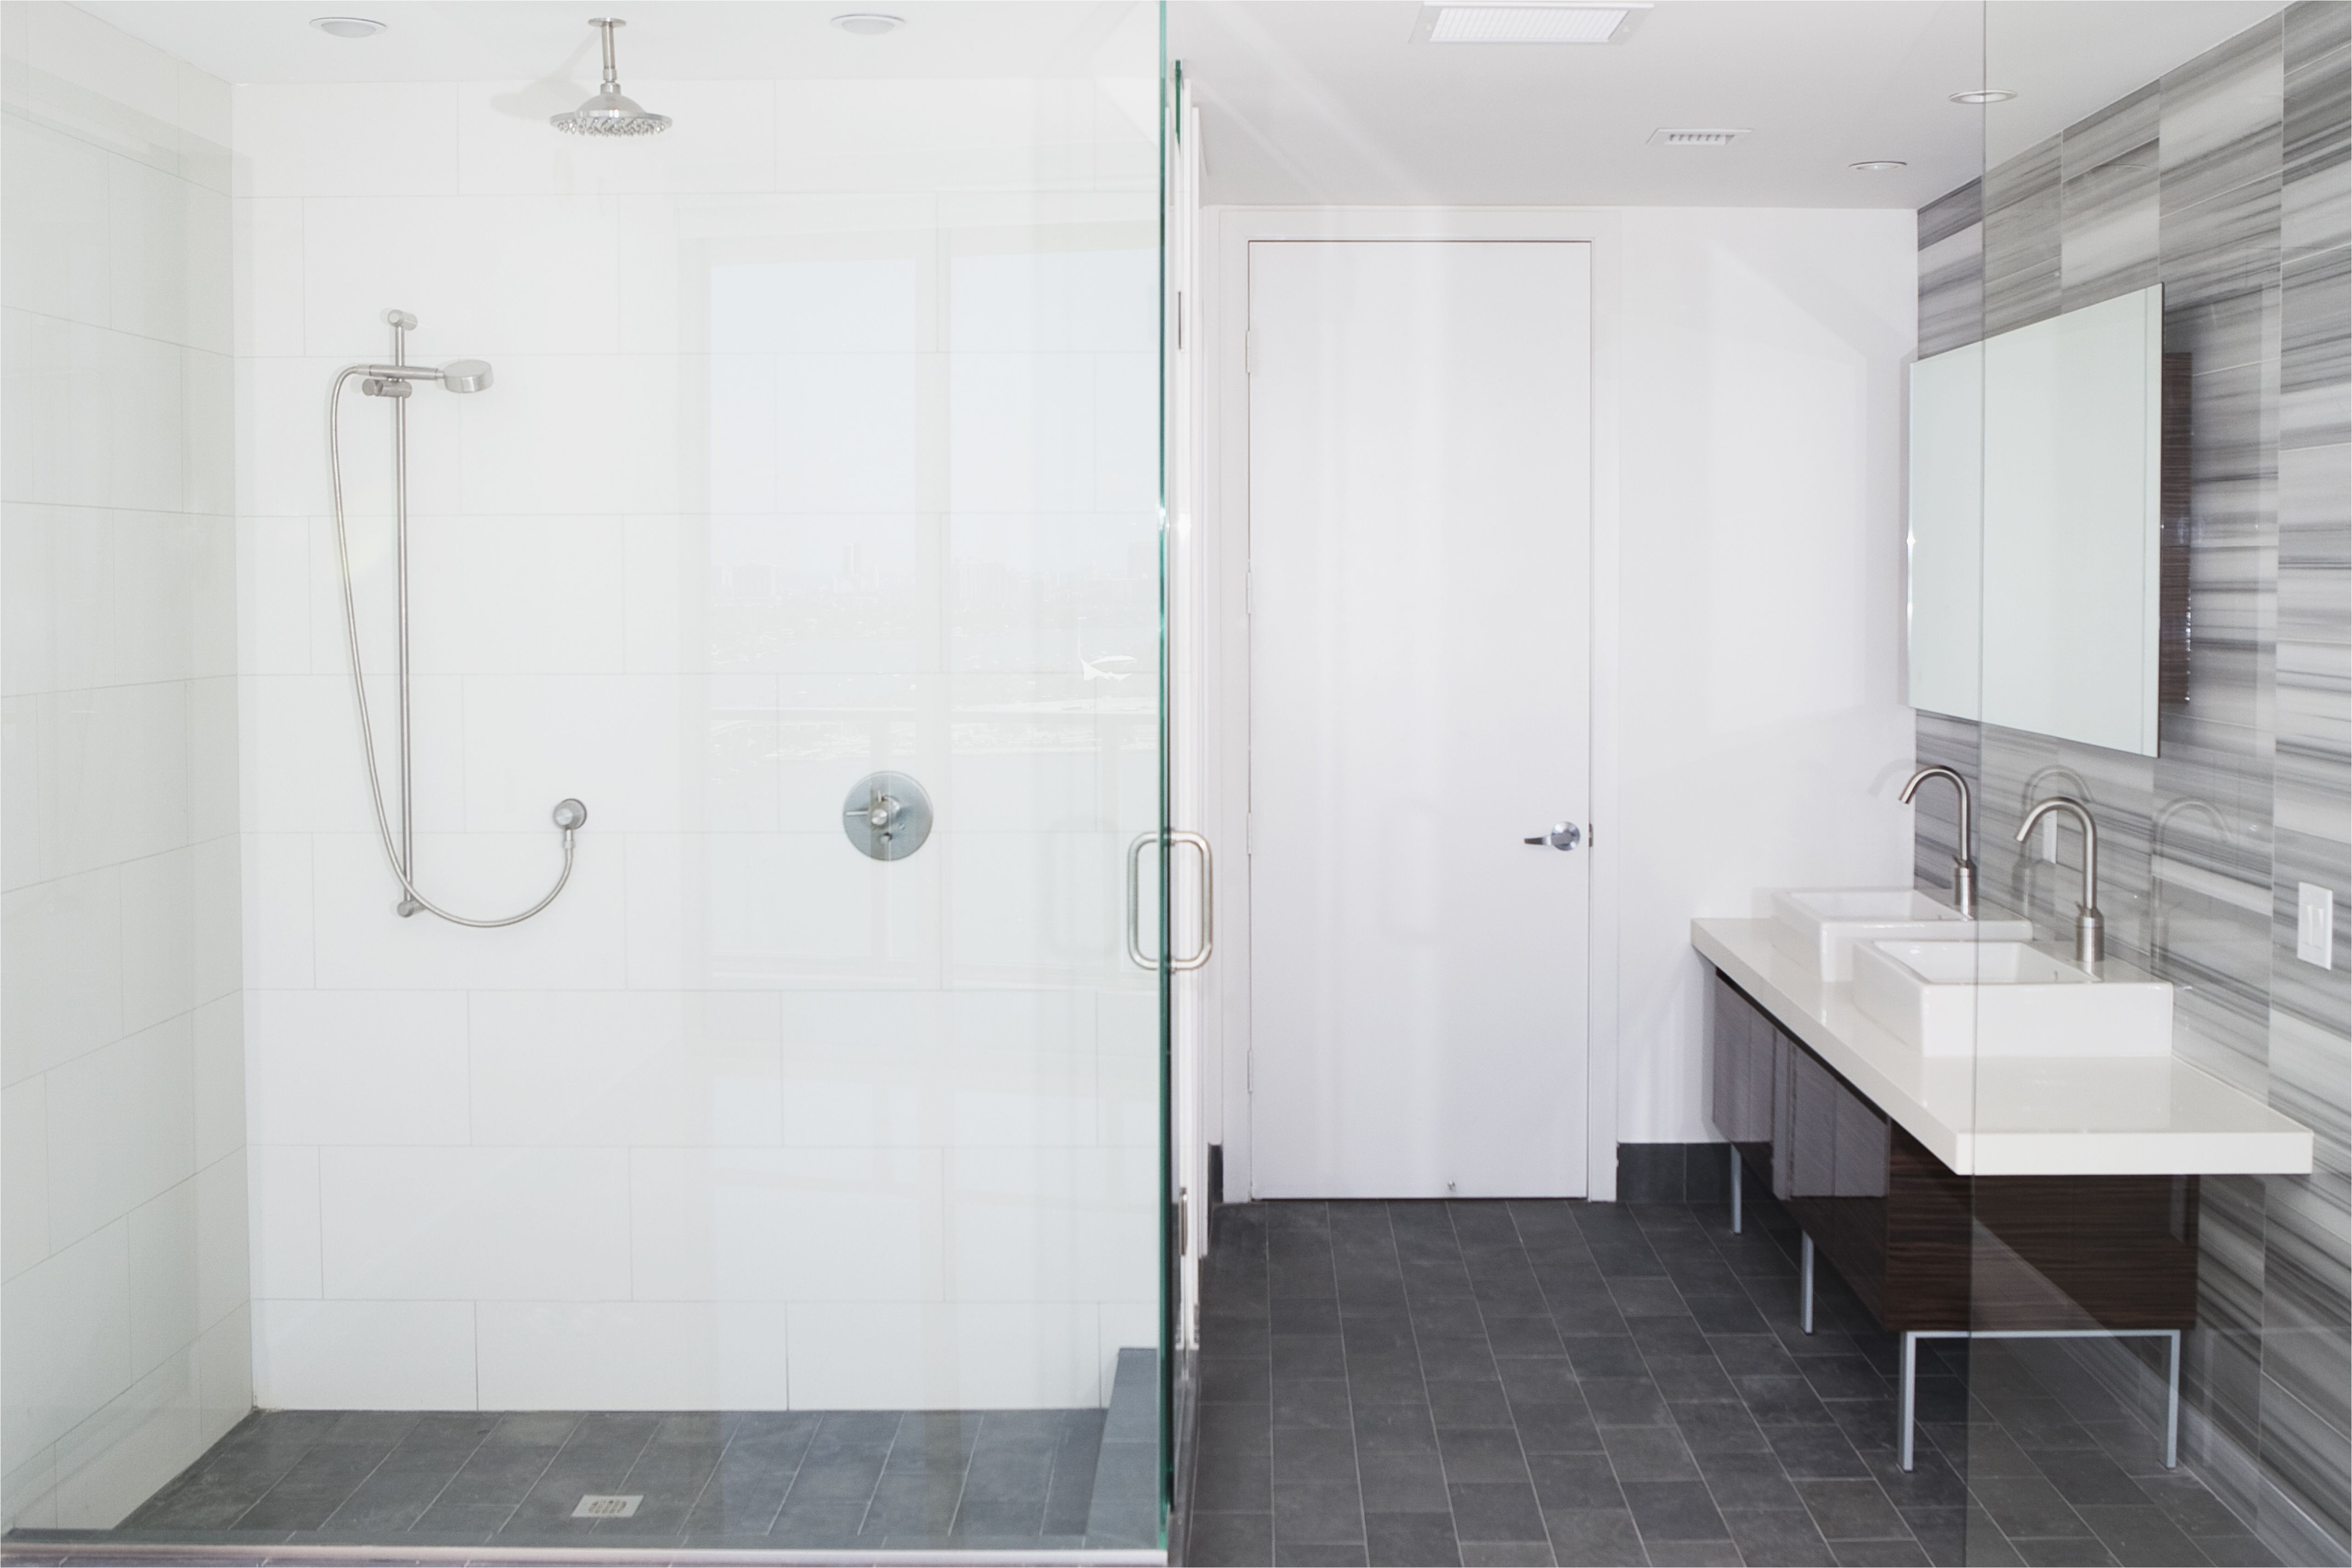 shower sinks and mirror in modern bathroom 533766223 588d18b45f9b5874ee14cb5c